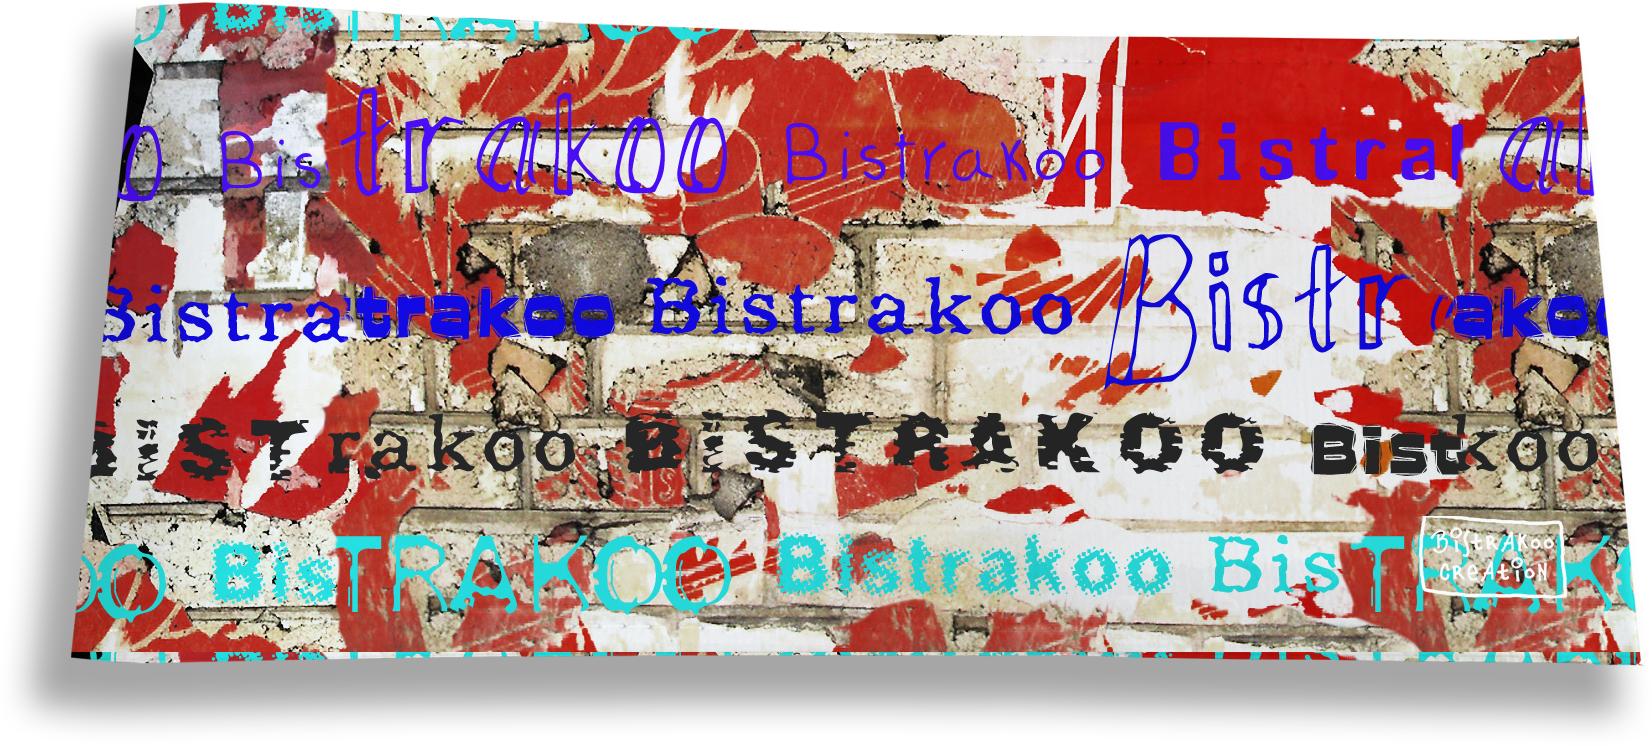 Porte-chéquier long horizontal motif Street art Bistrakoo 2289